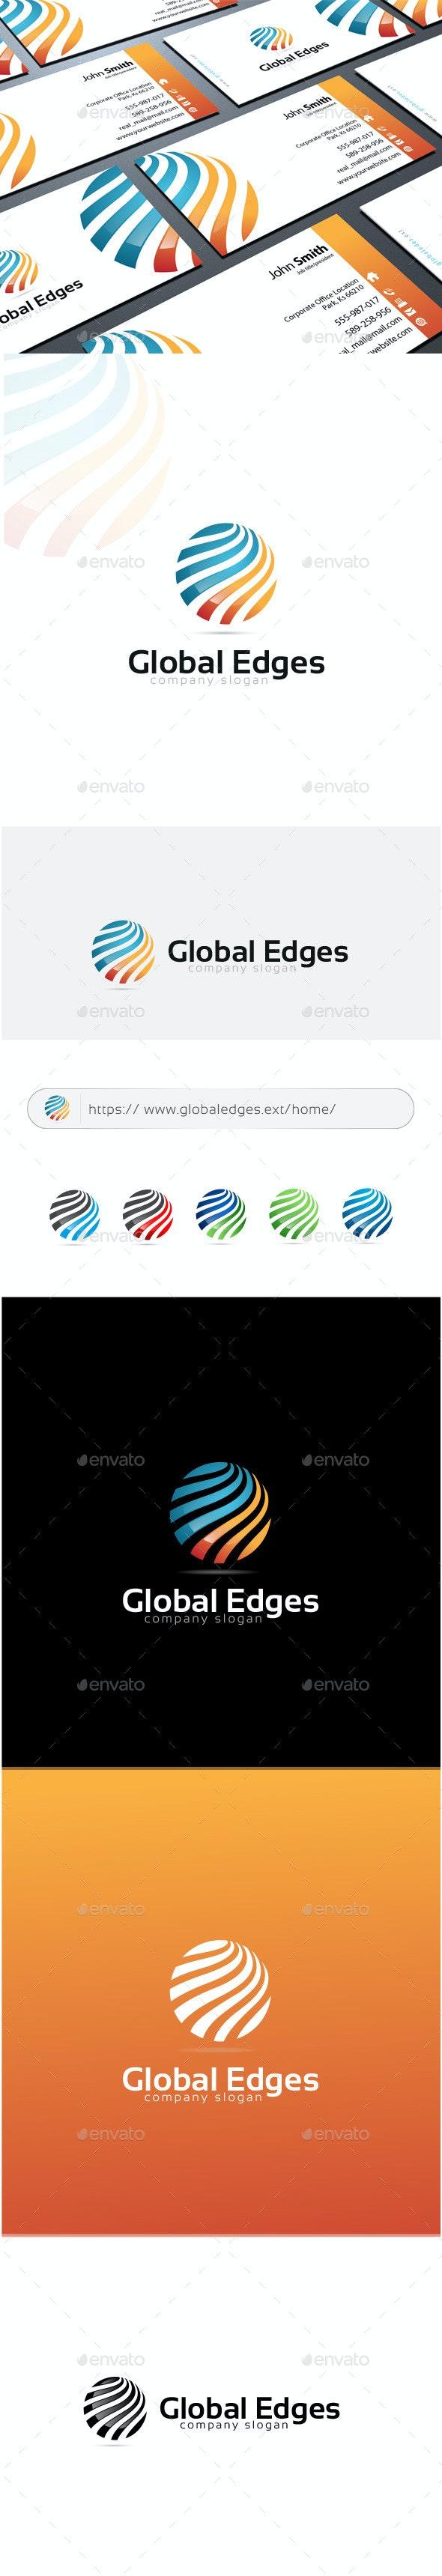 Global Edges Logo - Abstract Logo Templates